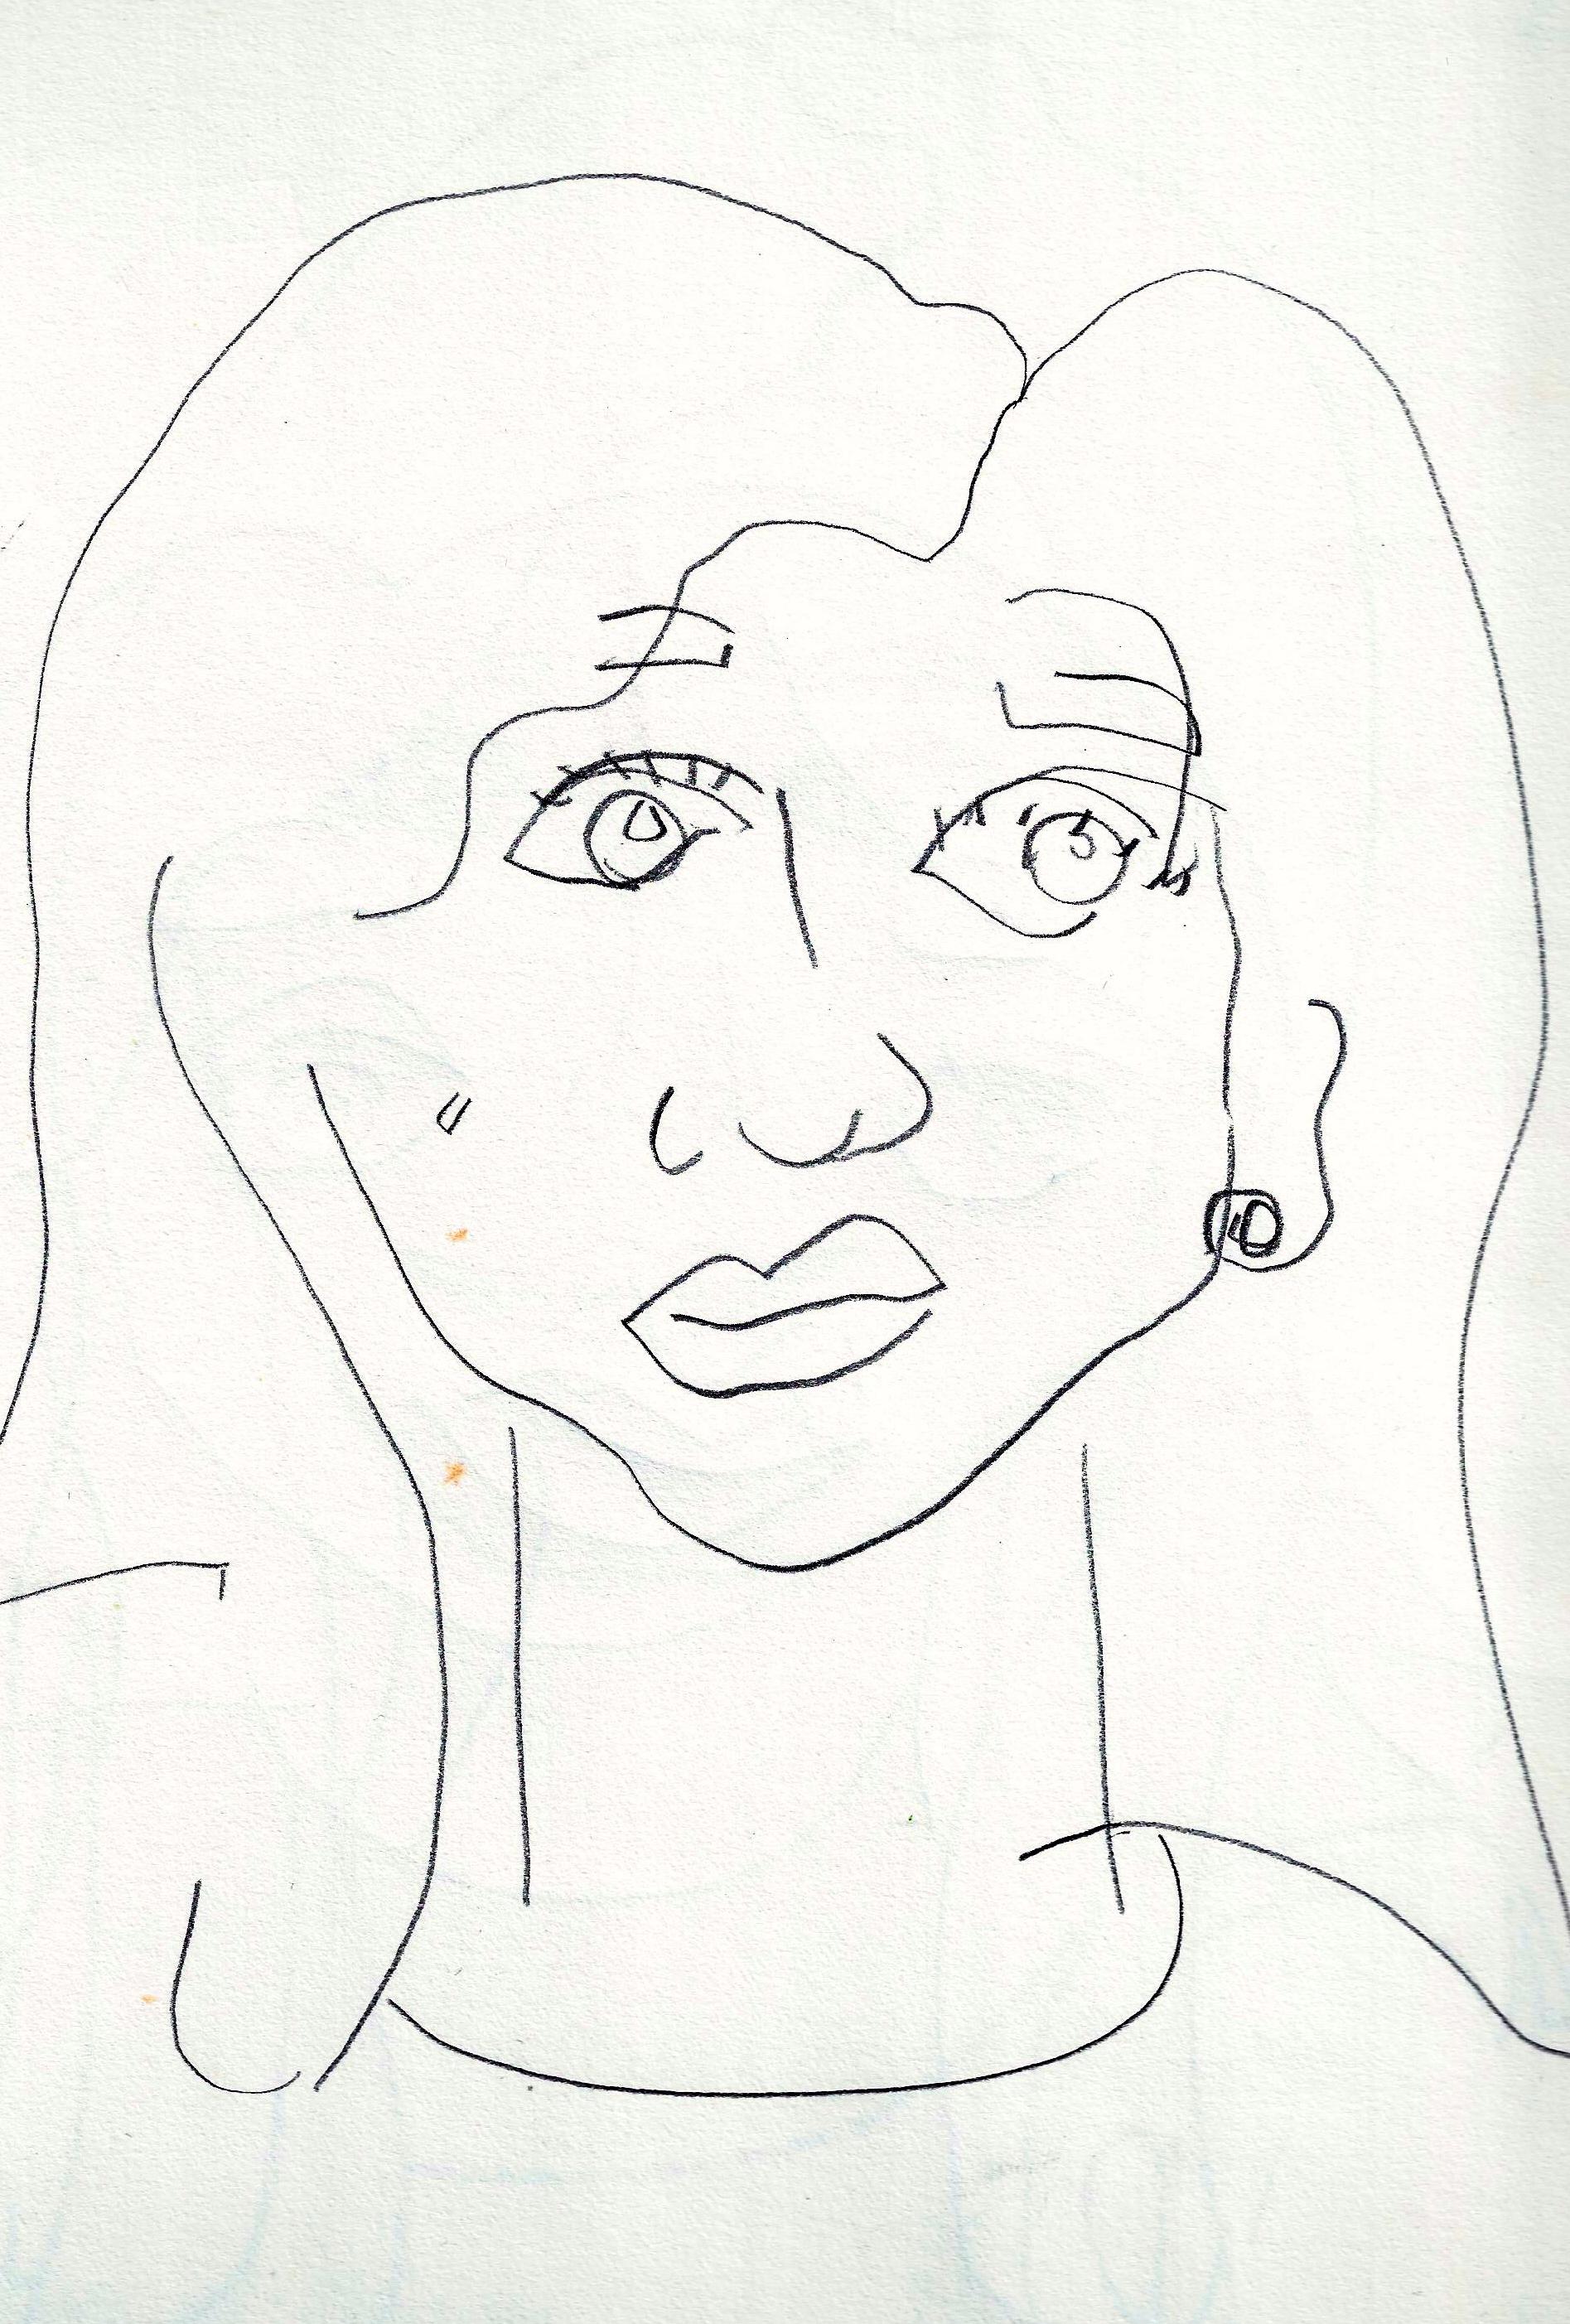 1895x2805 Self Portrait Line Drawing Blind Contour Line Drawing Self